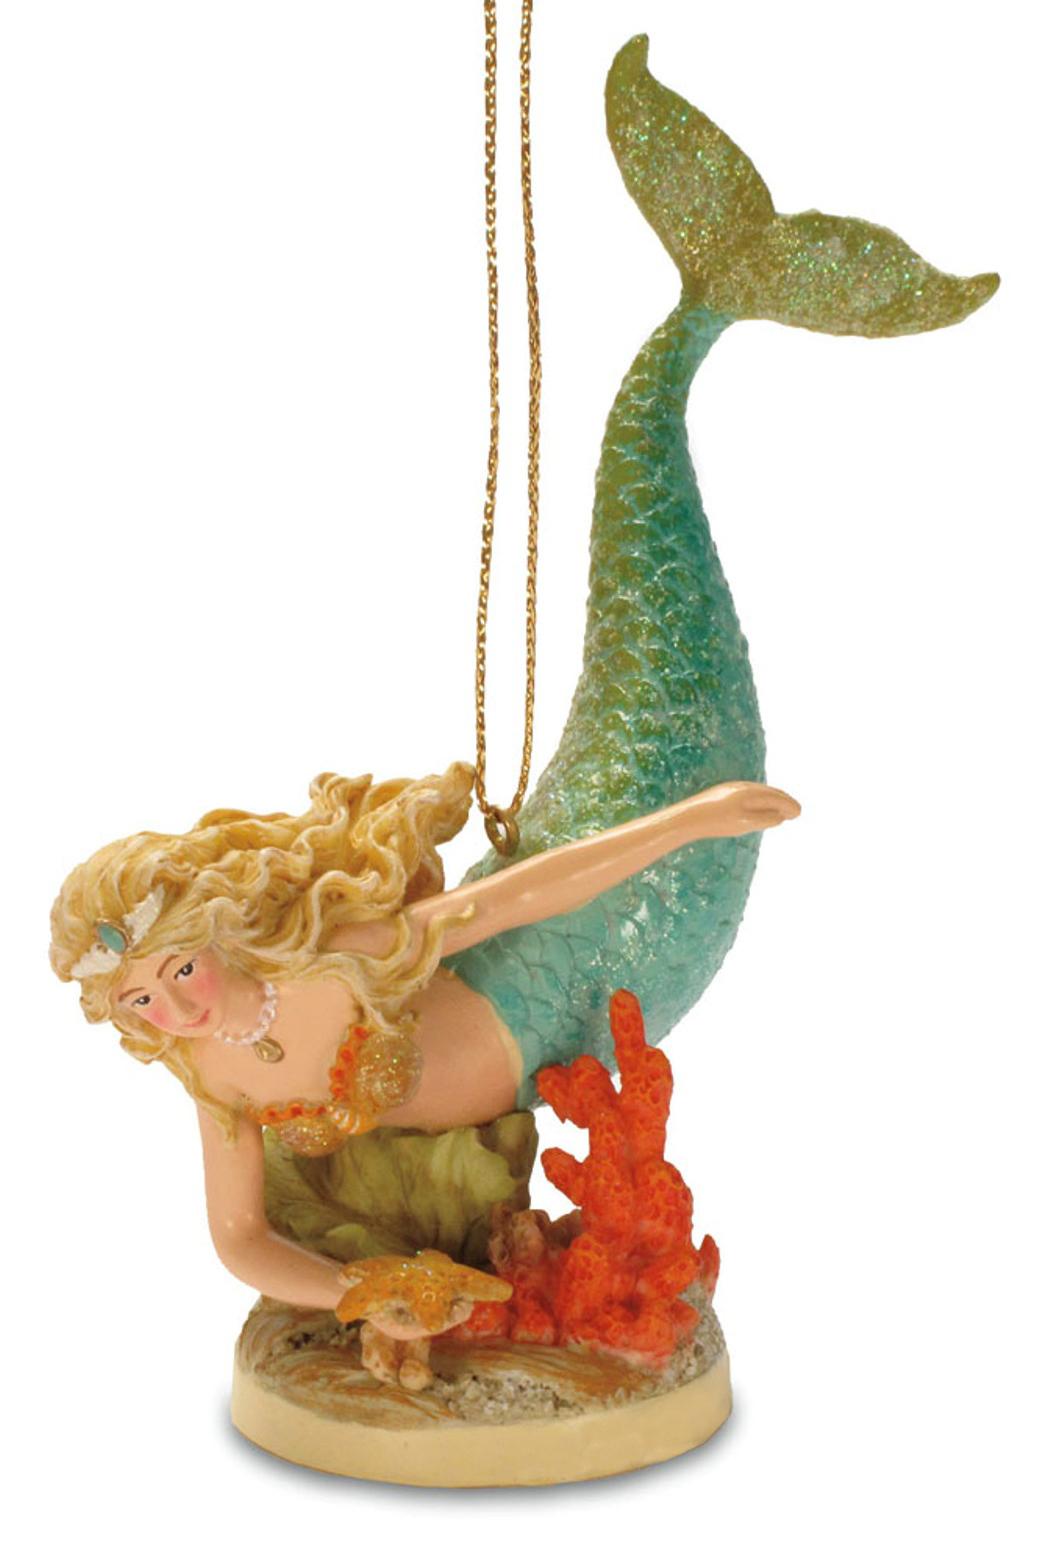 Tropical beach mermaid island christmas tree ornament for Christmas tree photo ornaments